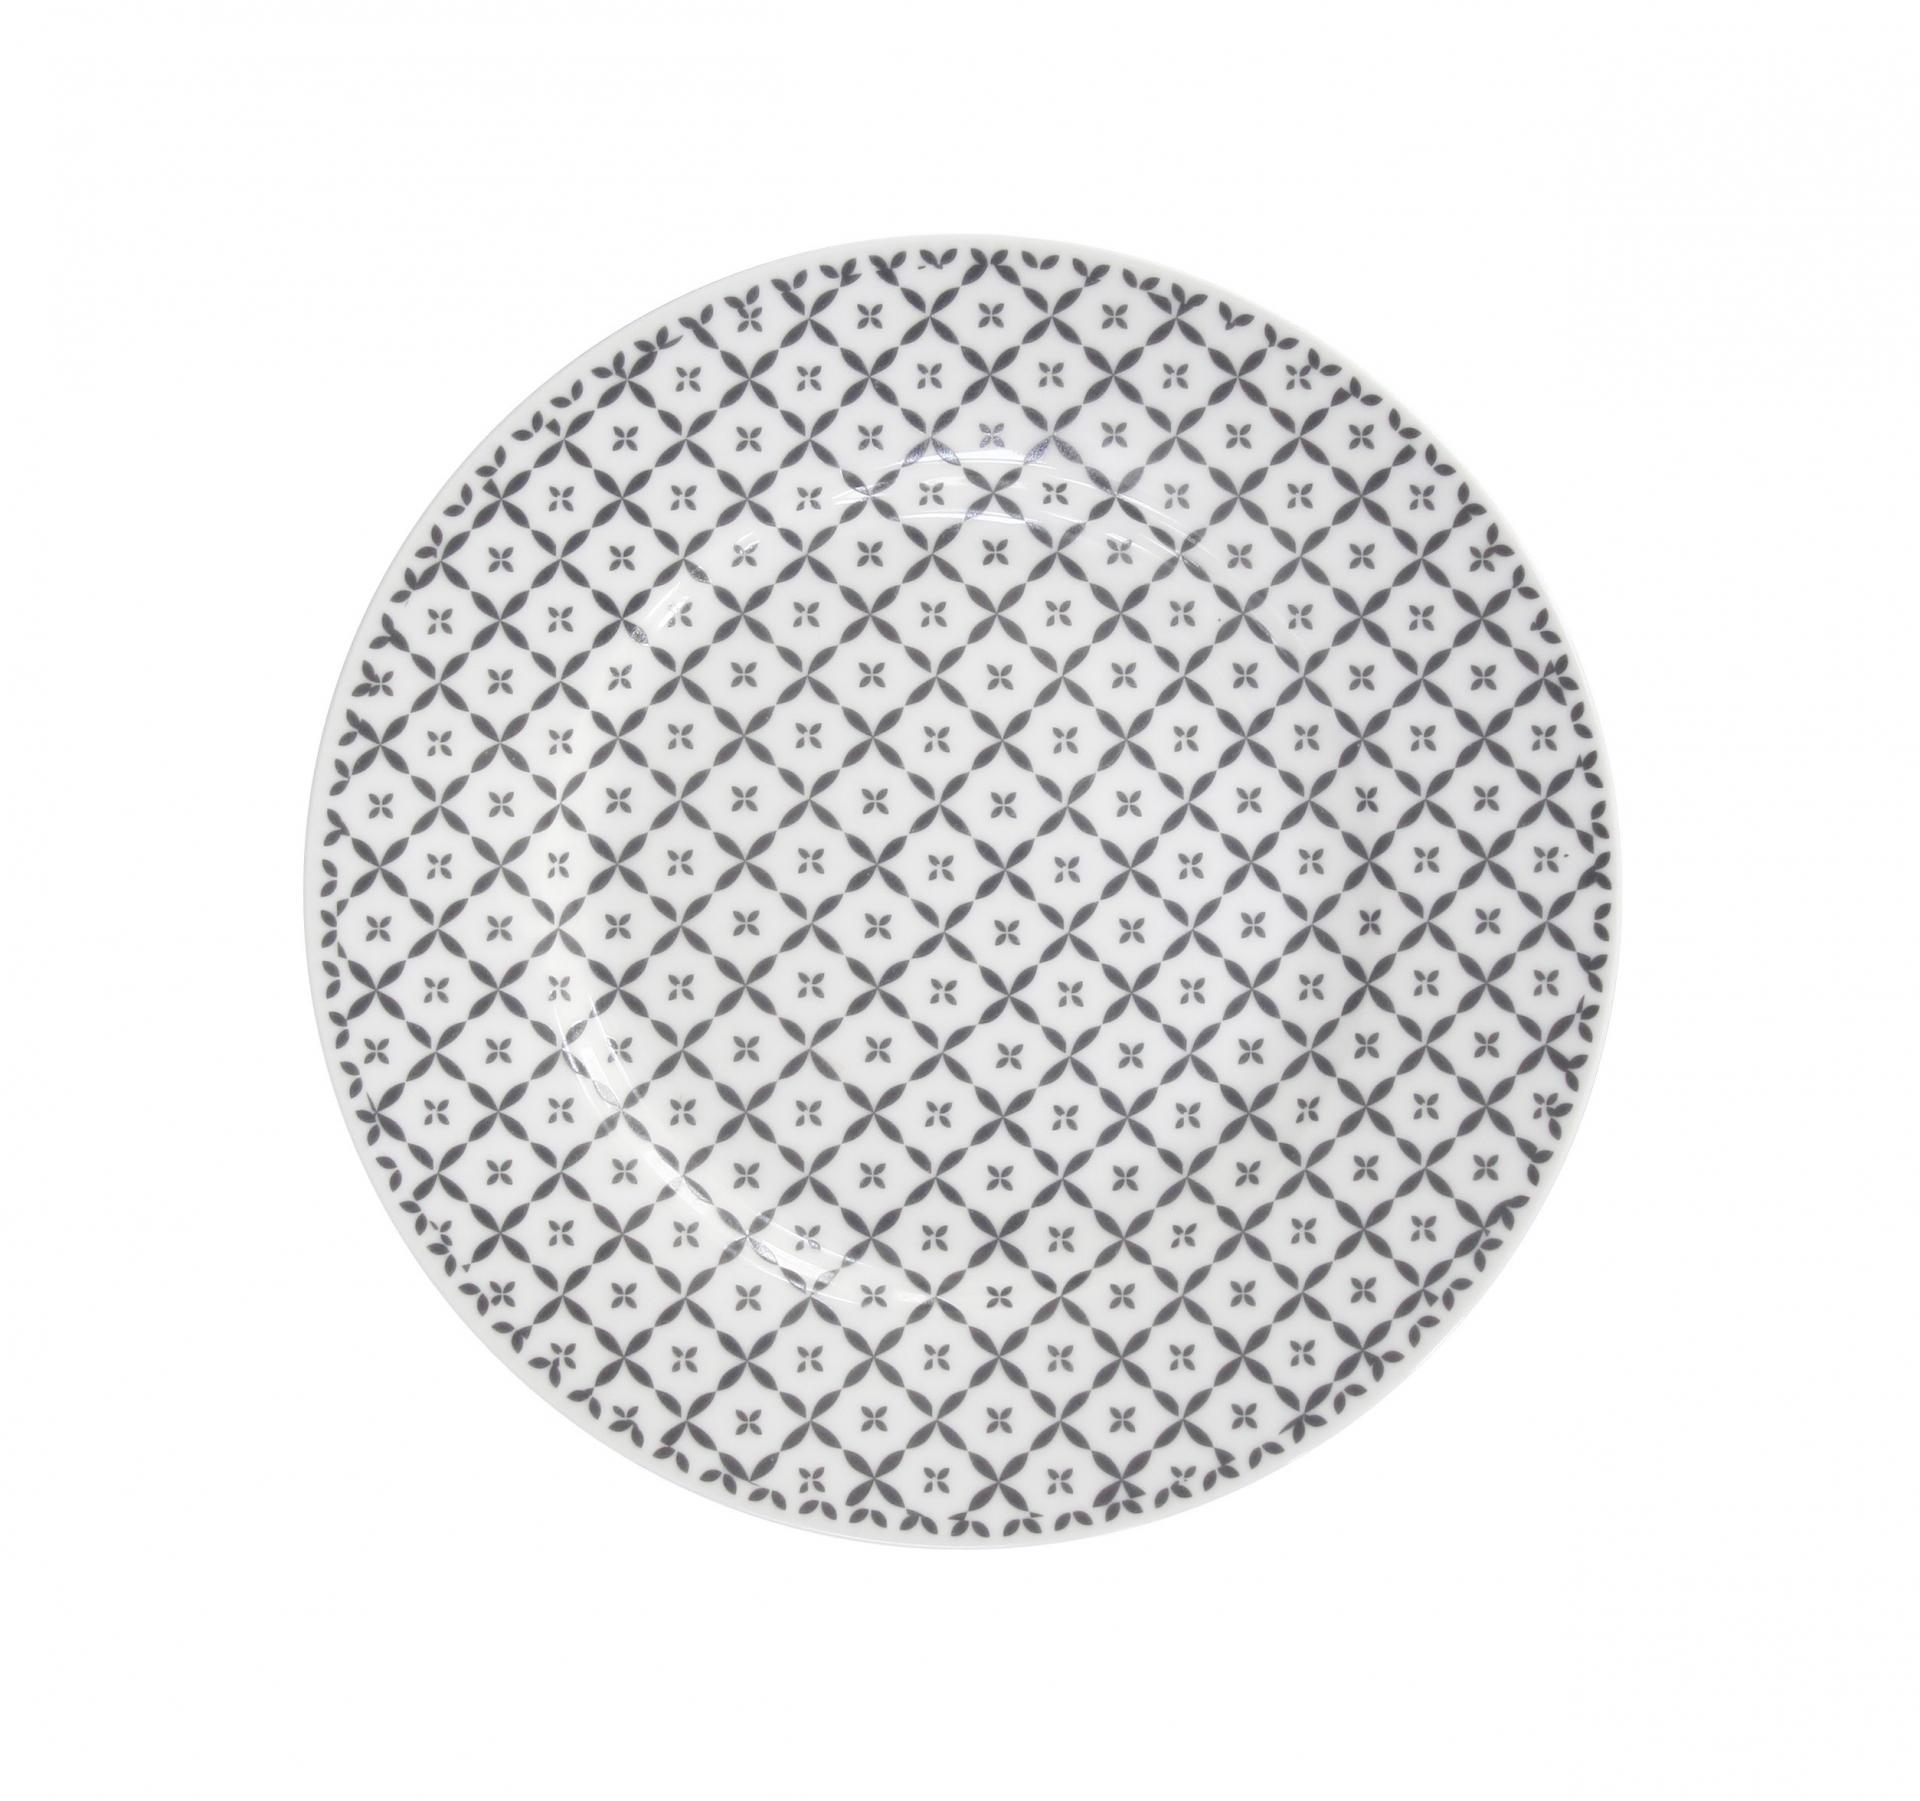 Krasilnikoff Dezertní talíř Charcoal diagonal, šedá barva, porcelán